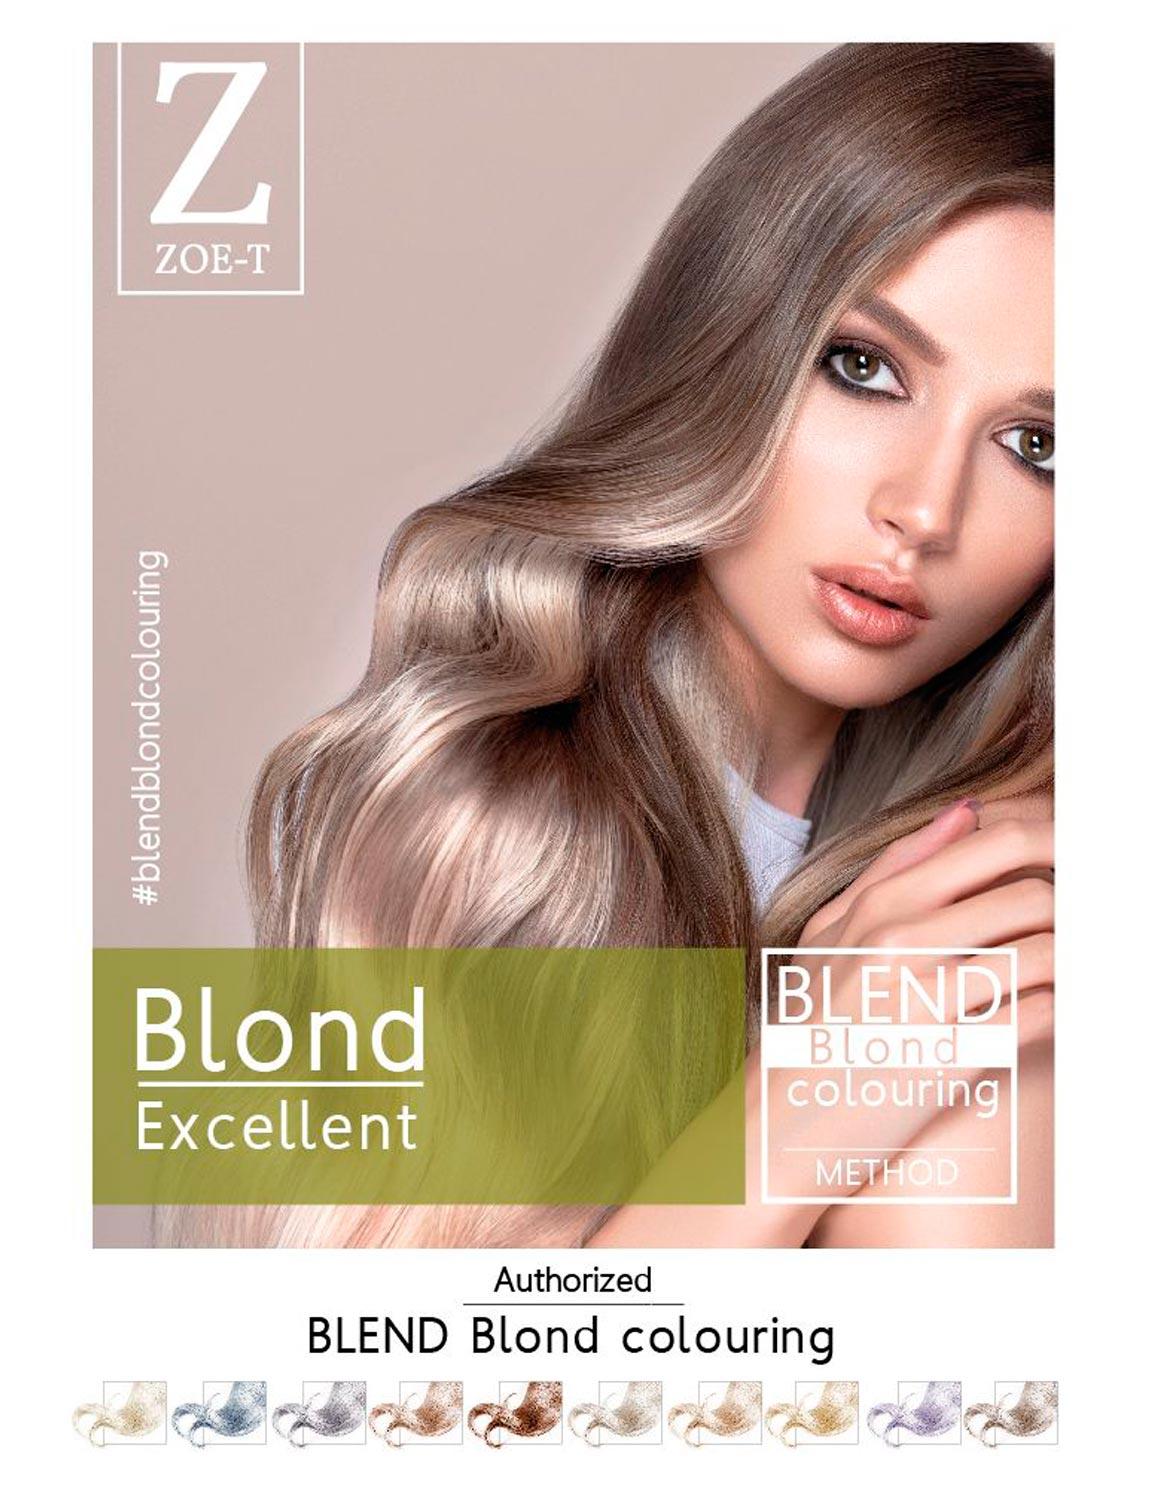 Blond Excellent